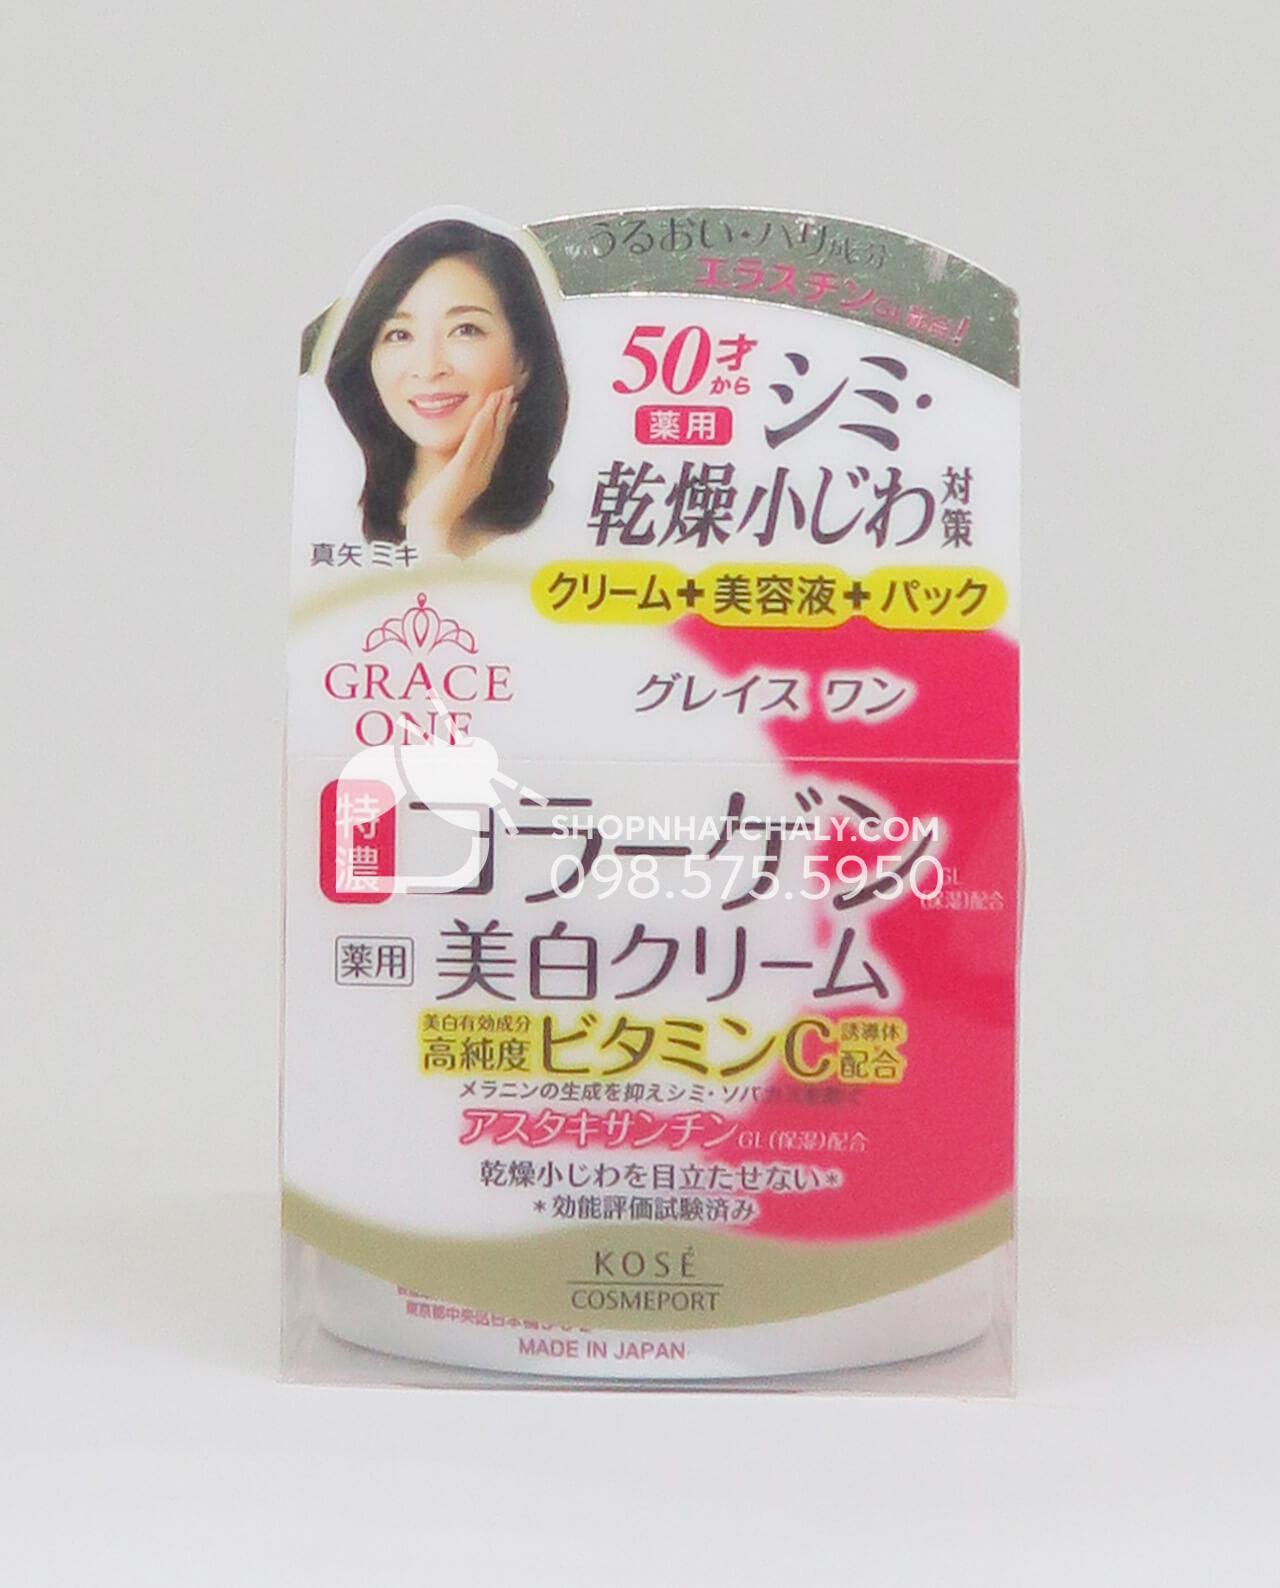 Kem dưỡng da Kose Grace One Whitening Perfect Gel Cream trị nám mẫu mới